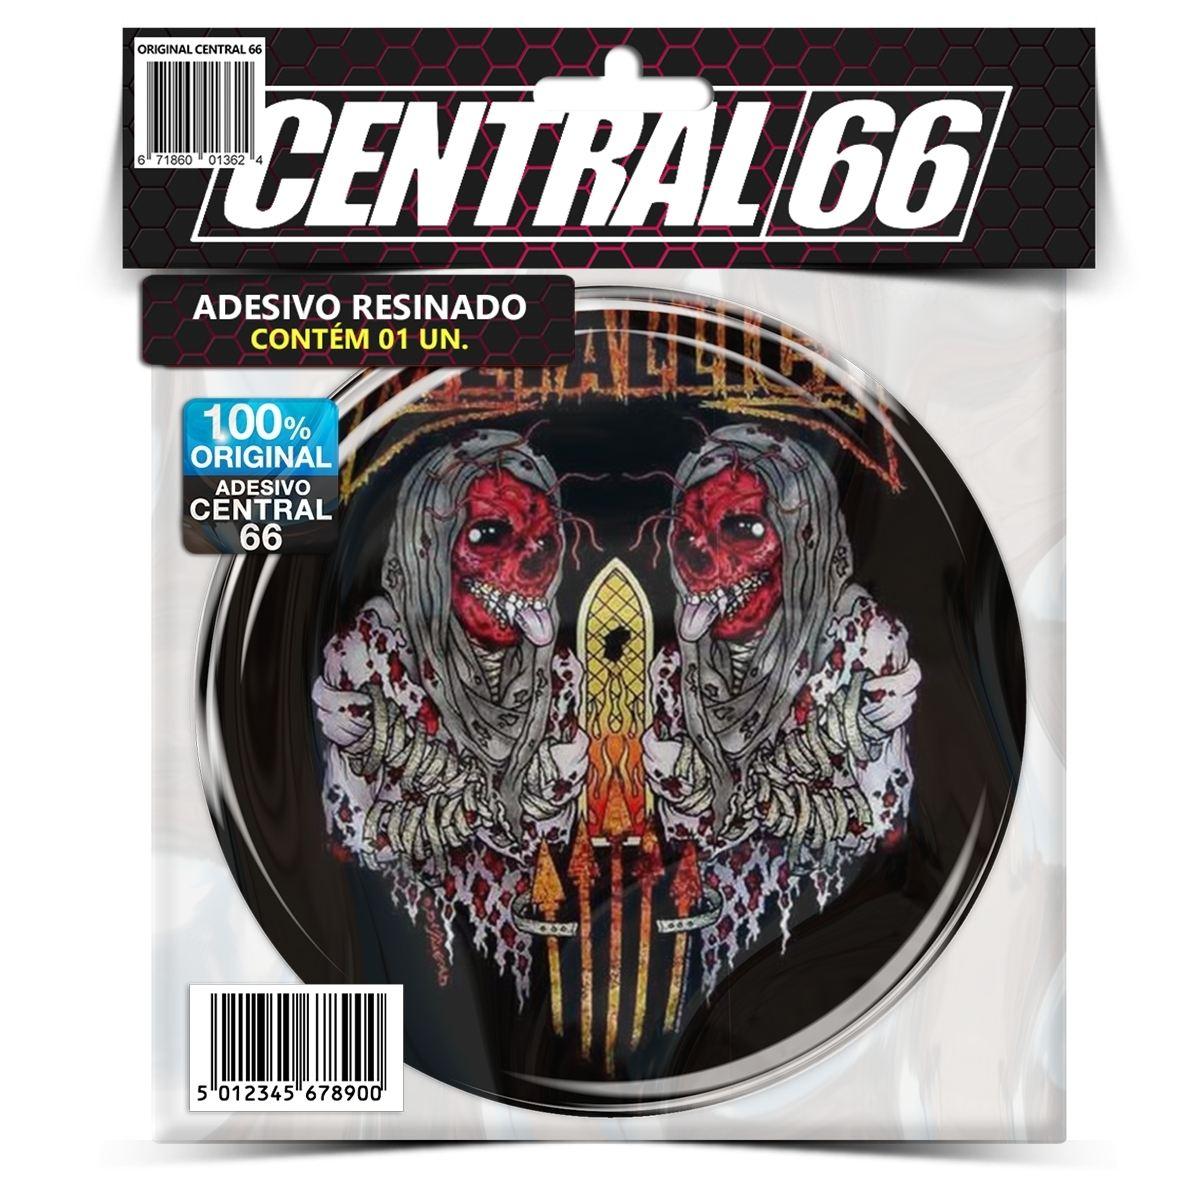 Adesivo Redondo Slipknot M05 – Central 66